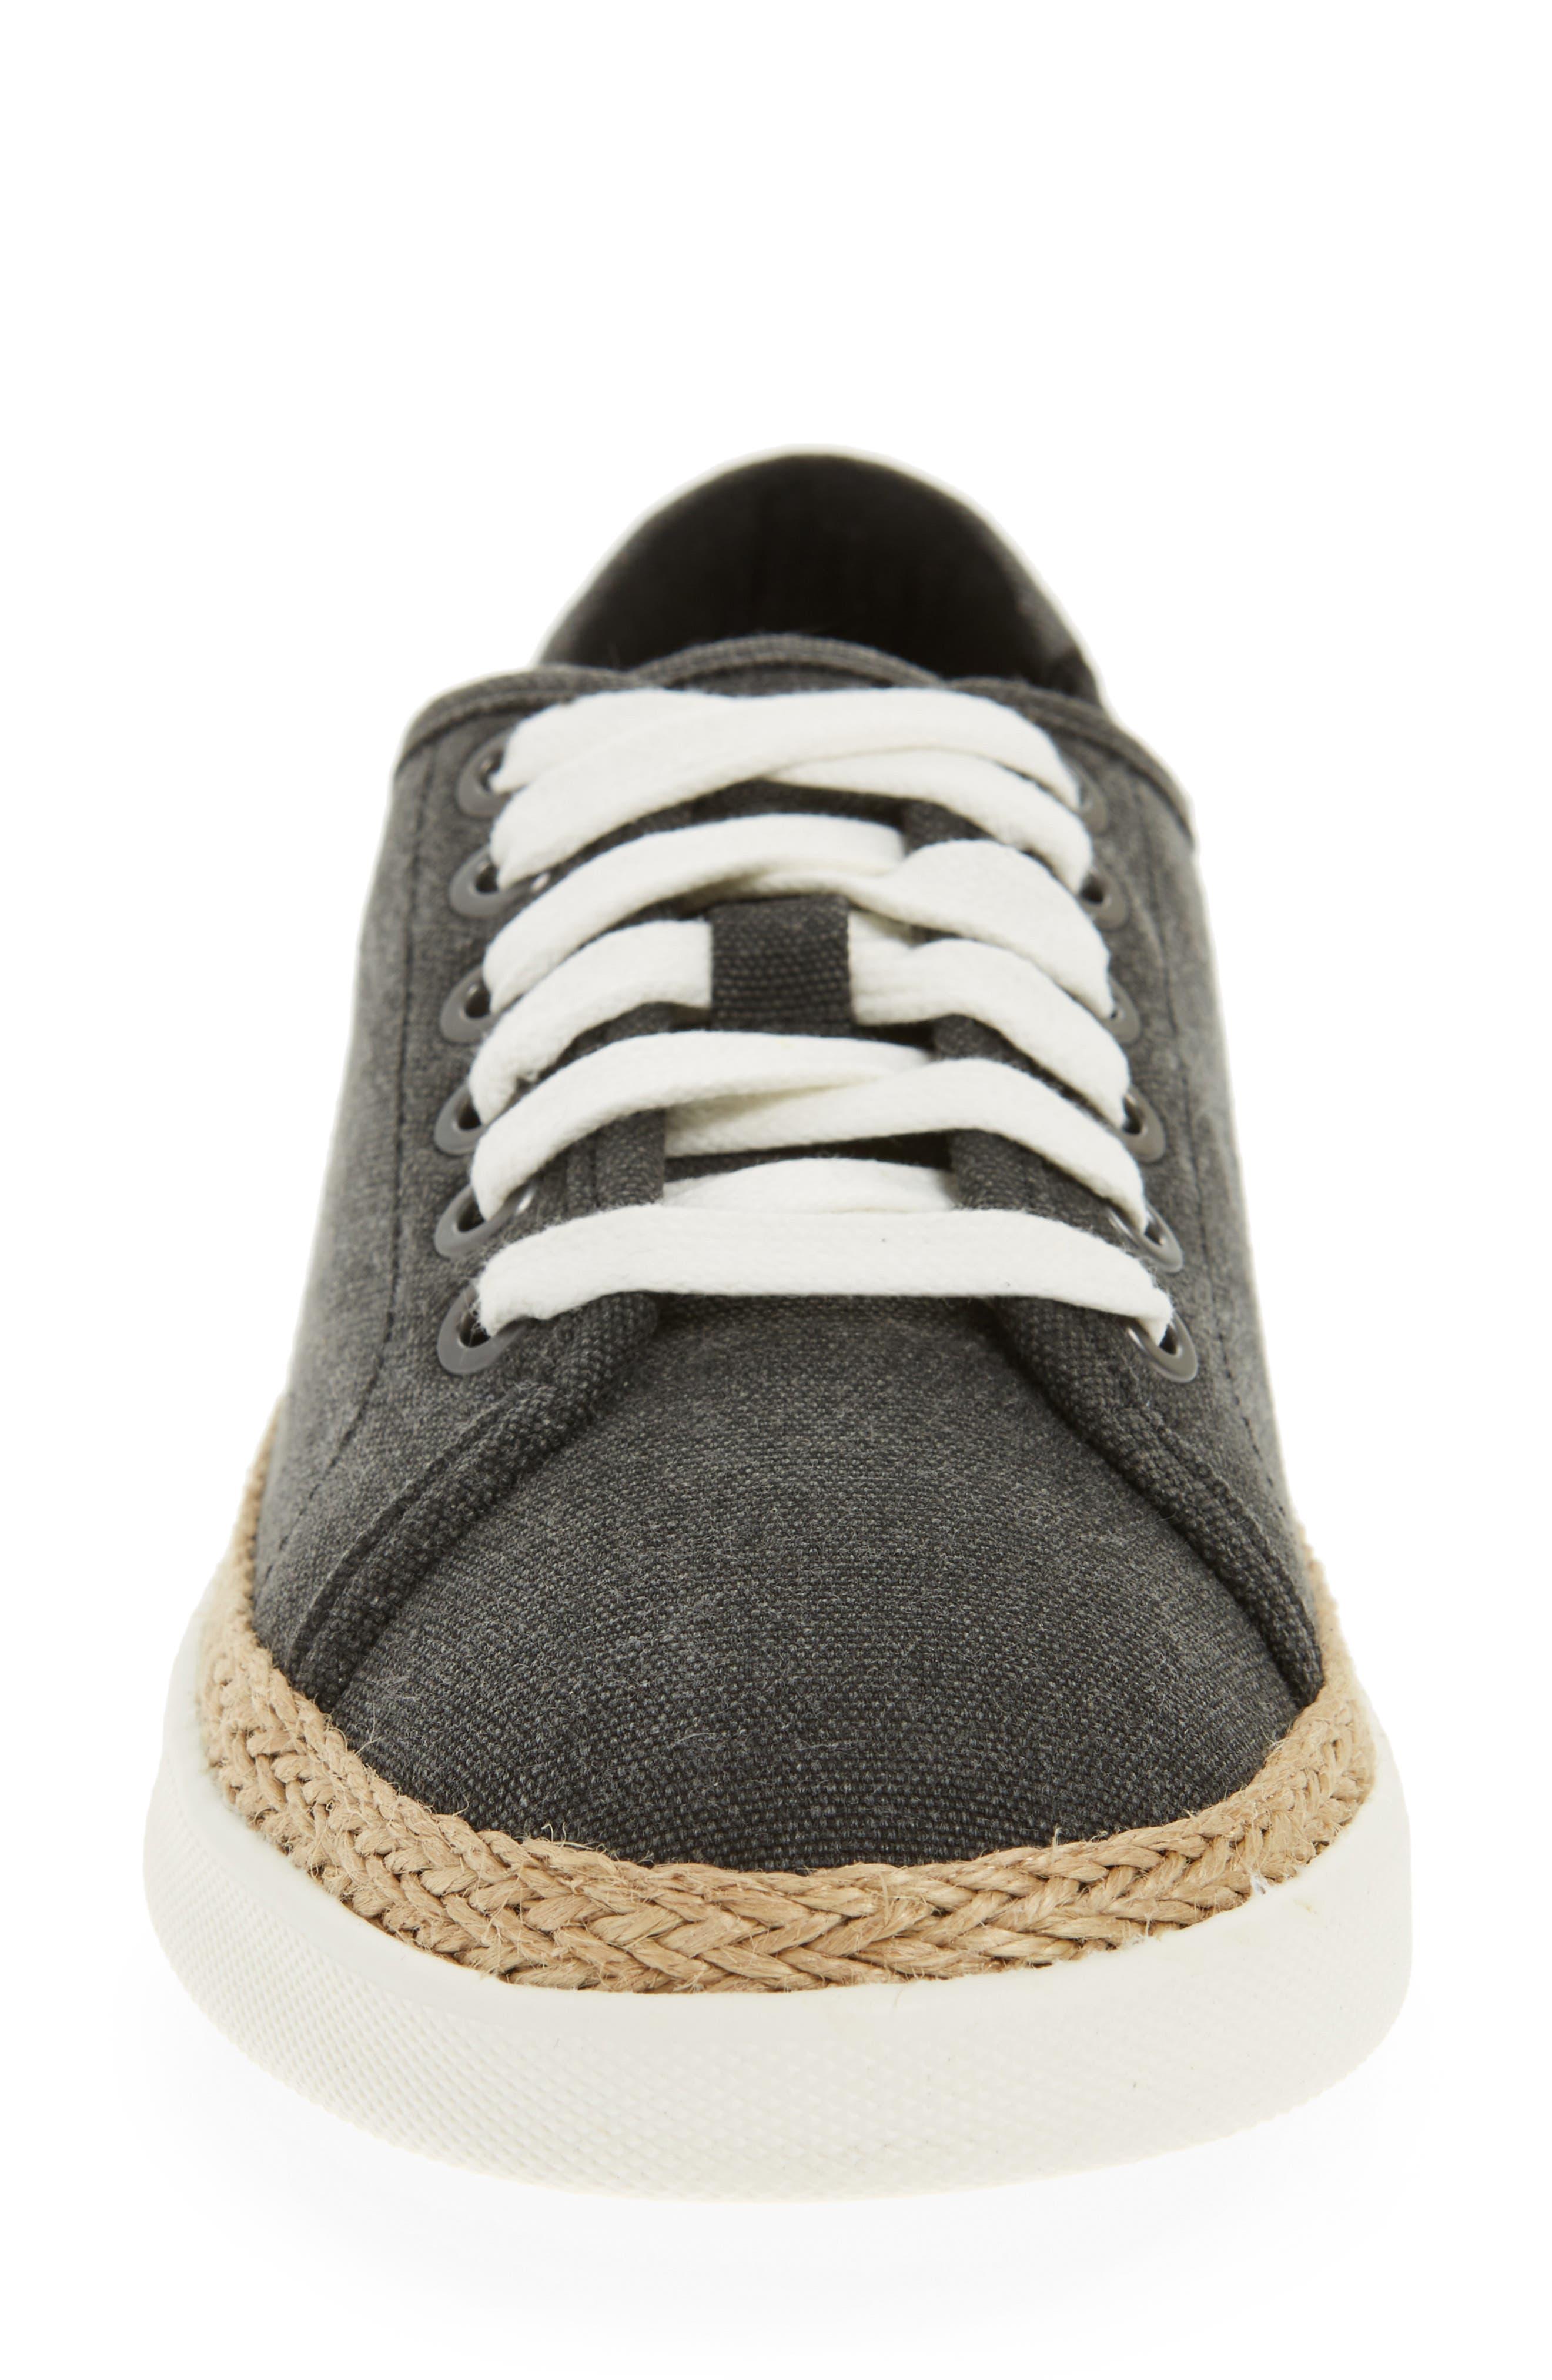 Hattie Sneaker,                             Alternate thumbnail 4, color,                             001